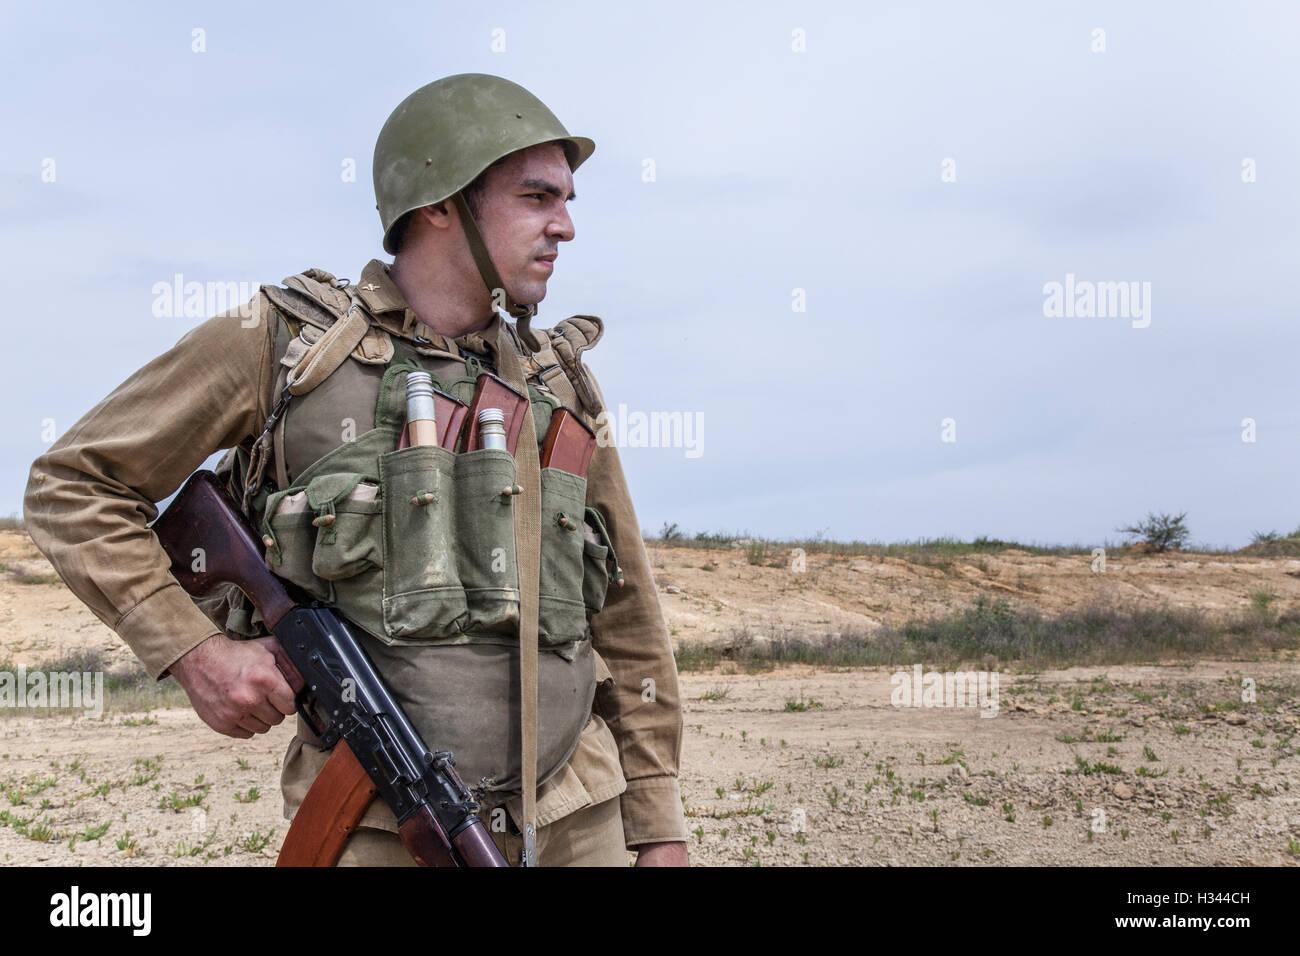 Soviet Afghanistan war - Page 6 Soviet-paratrooper-in-afghanistan-H344CH